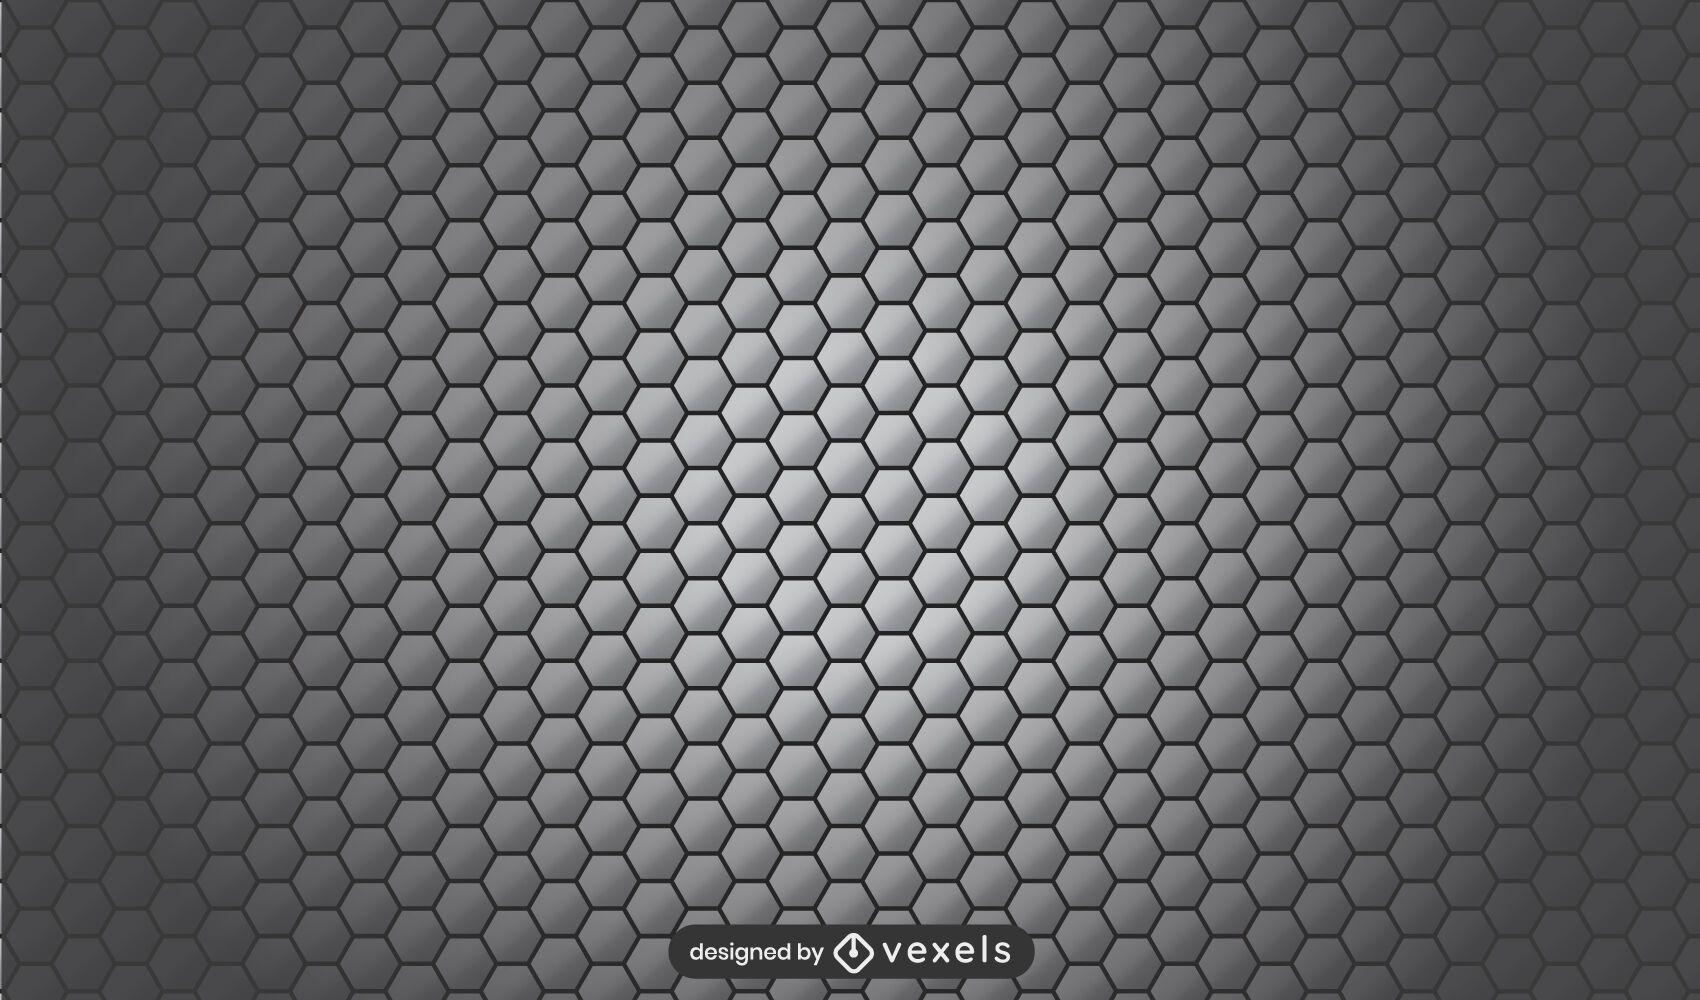 Honeycomb gray pattern